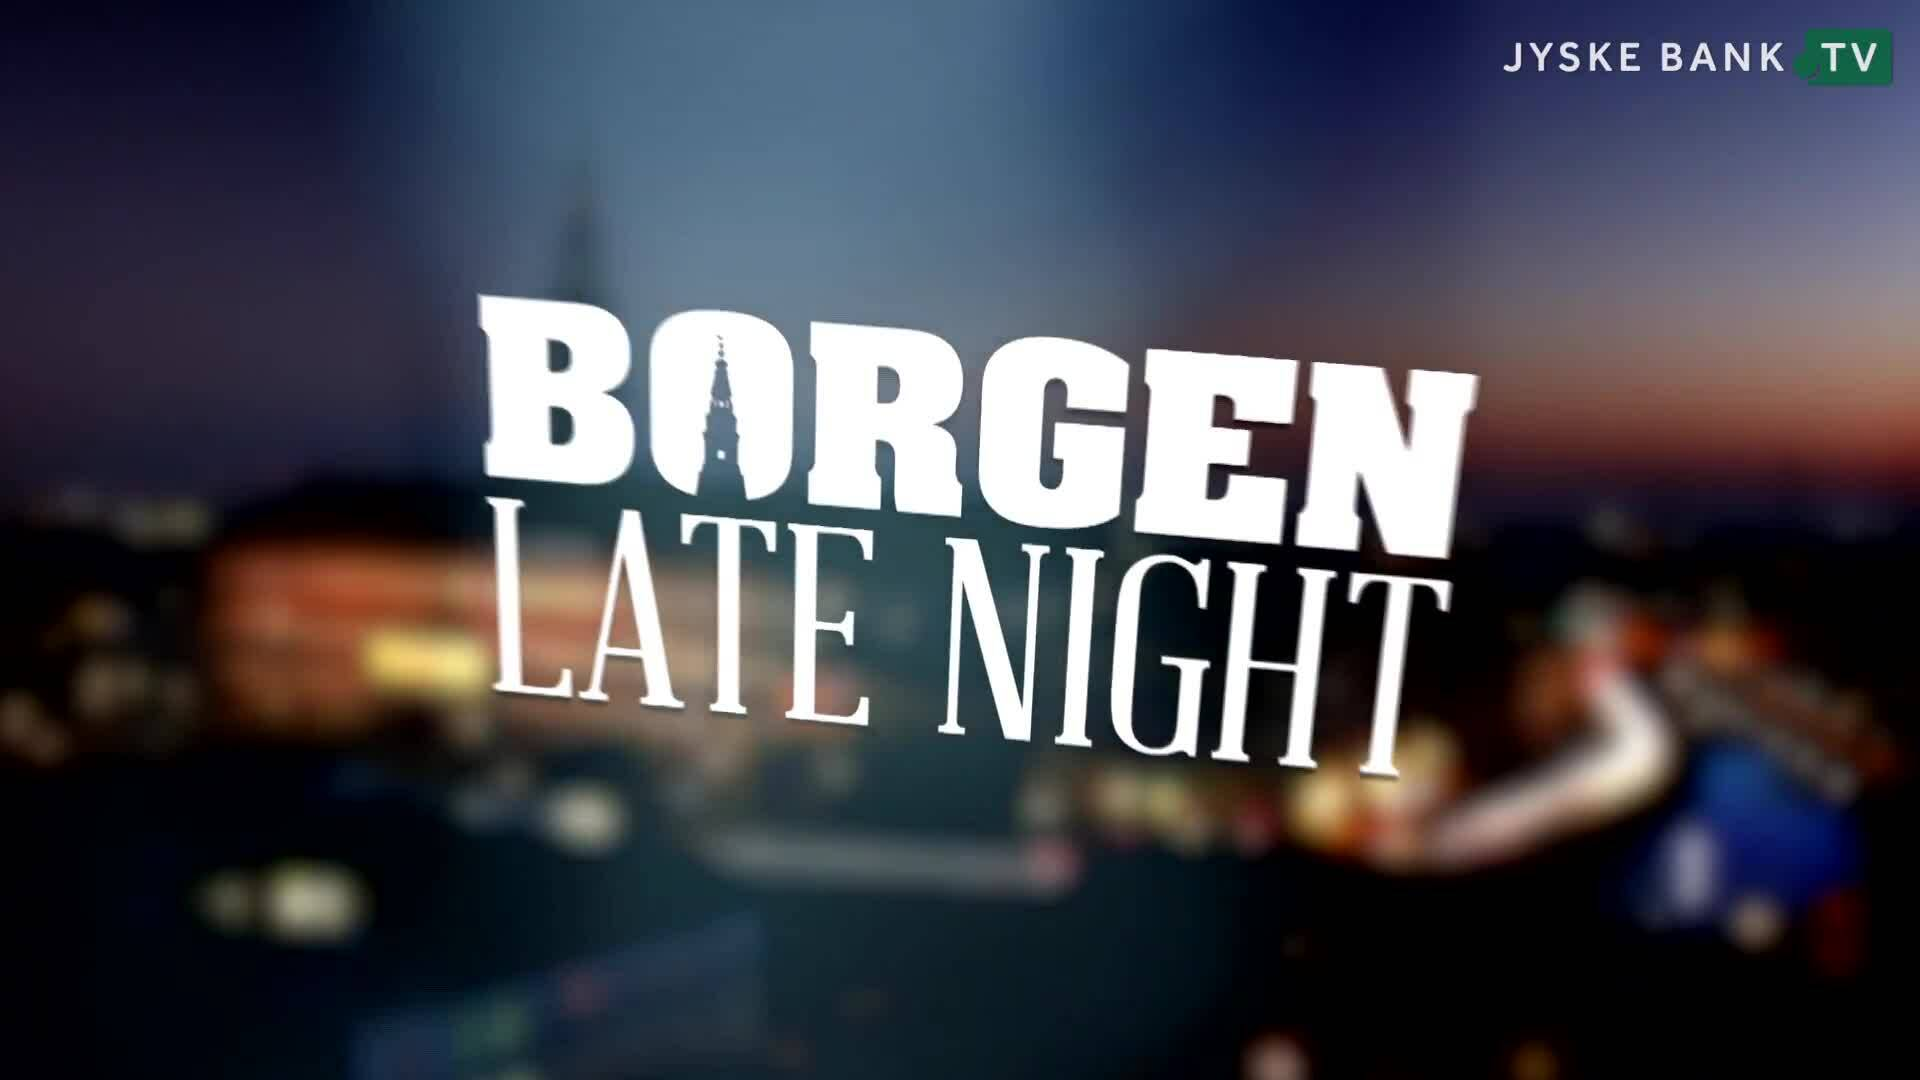 Borgen Late Night om folketingets åbning